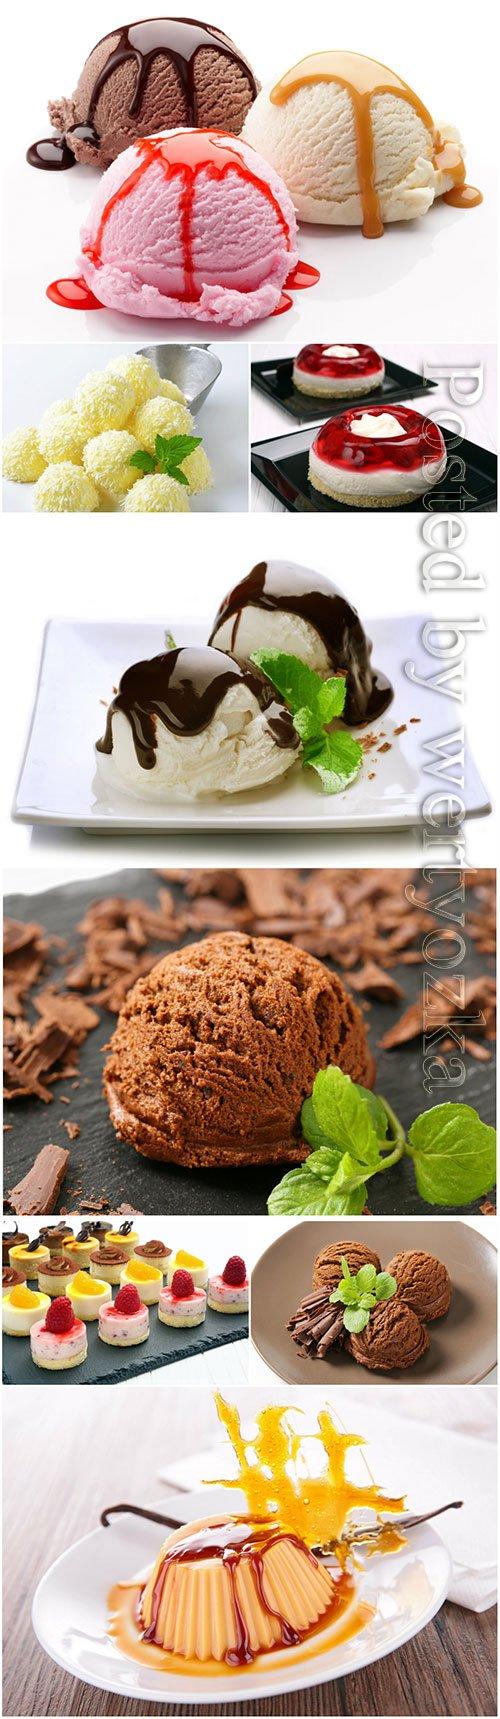 Delicious desserts, ice cream, cakes, sweets